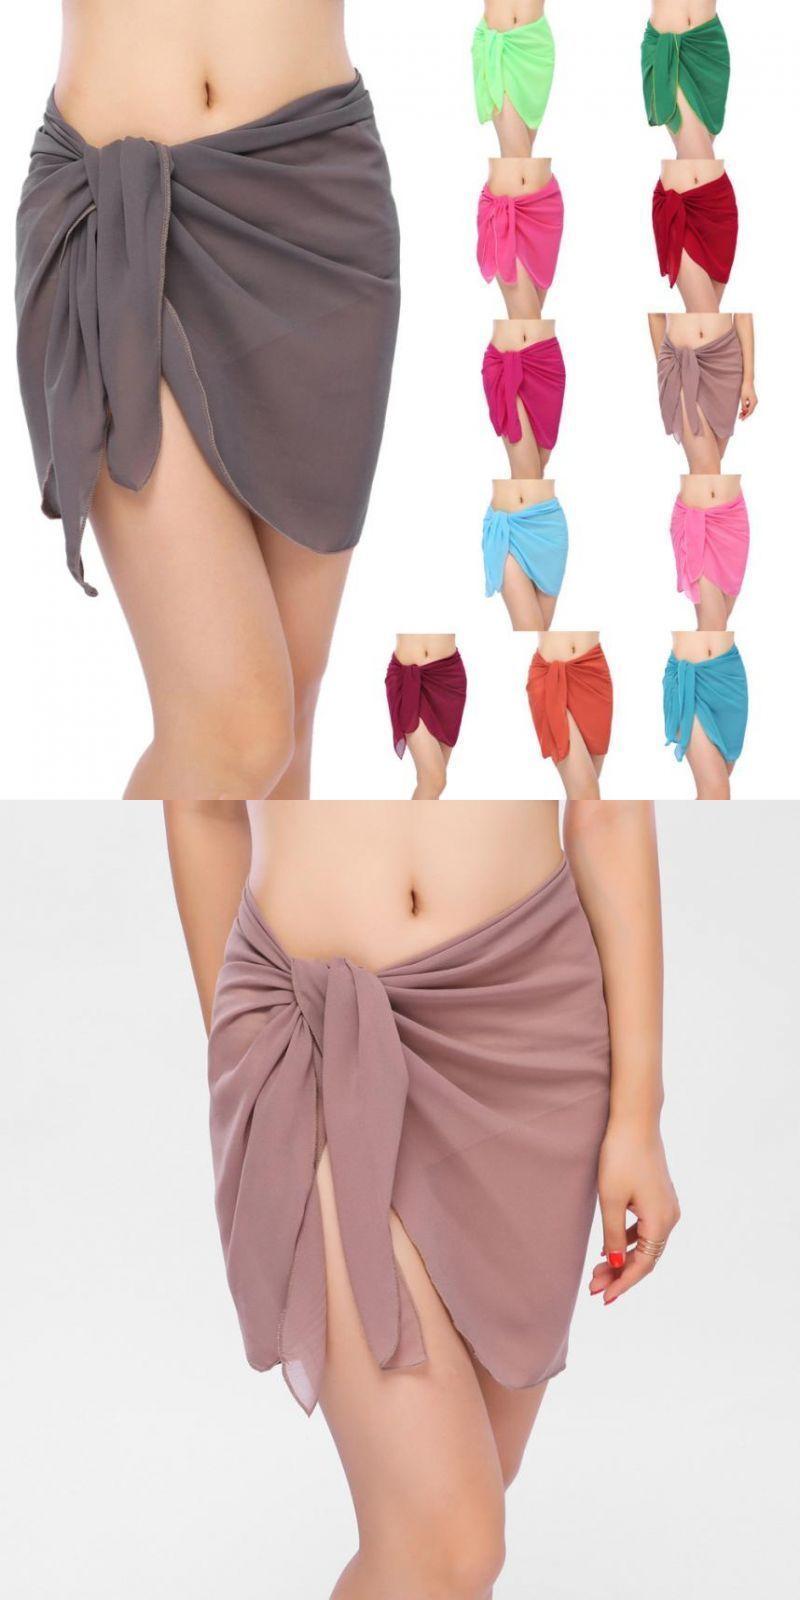 769561d61e Summer beach wear skirts women solid cover up chiffon bikinis swimwear wrap  swimsuit bathing suit cover